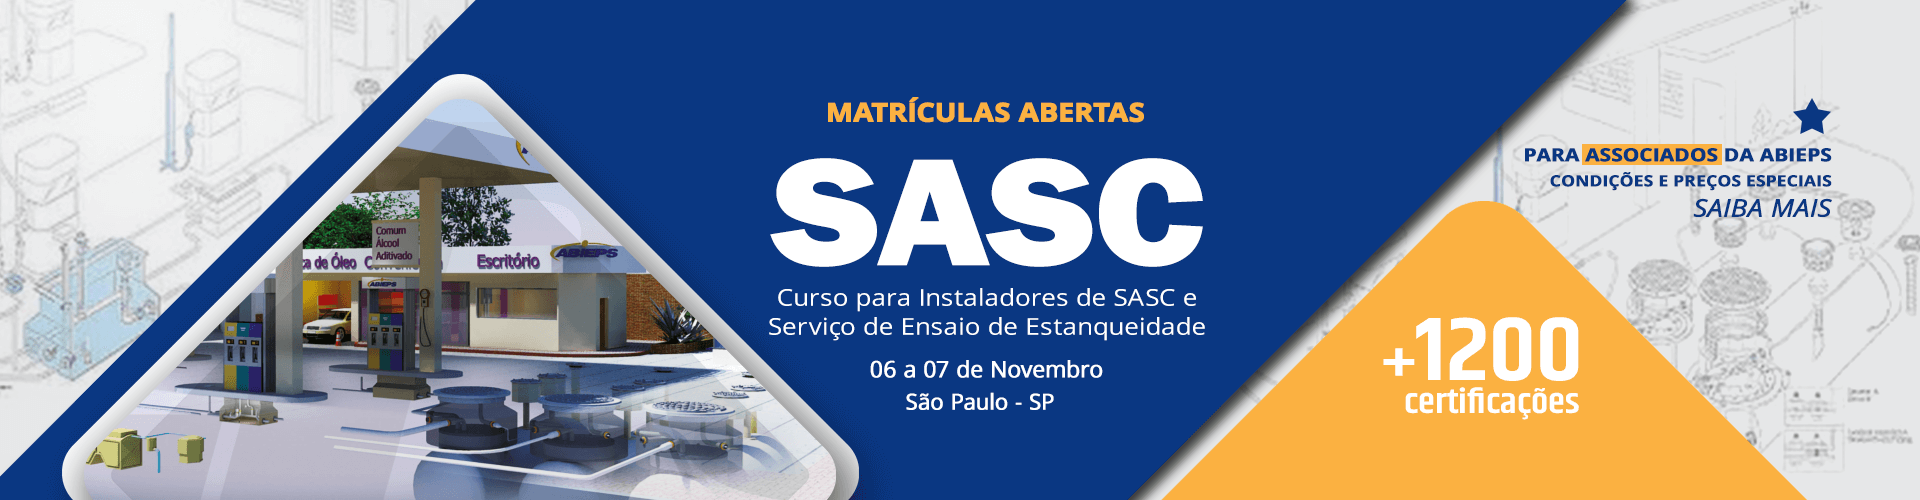 Curso para Instaladores de SASC e Serviço de Ensaio de Estanqueidade